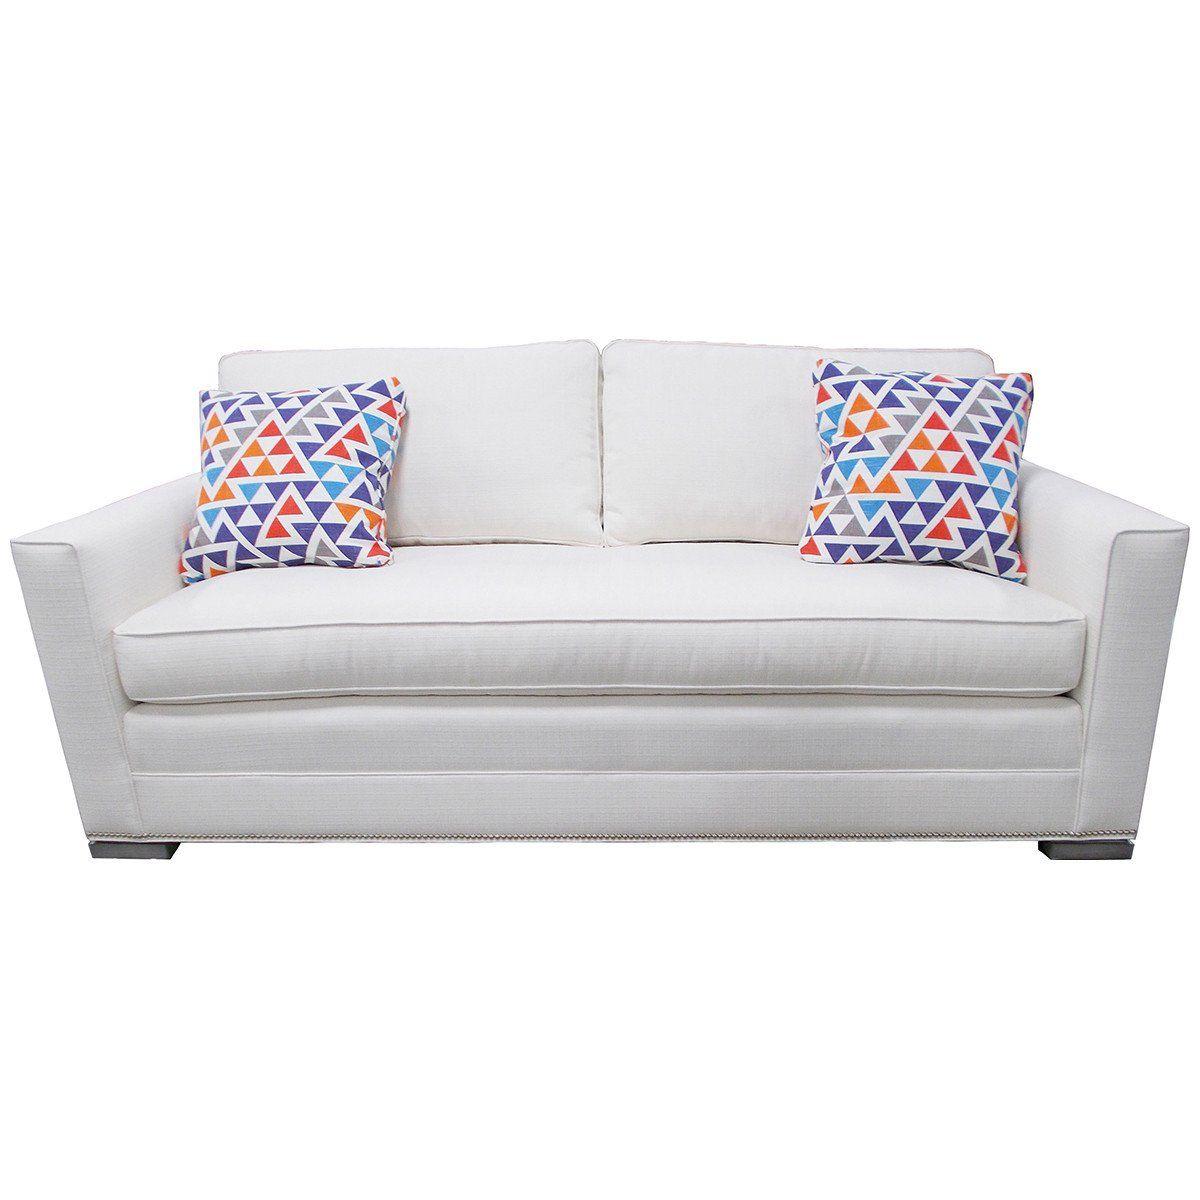 Vanguard Furniture Summerton Newcomer Salt One Cushion